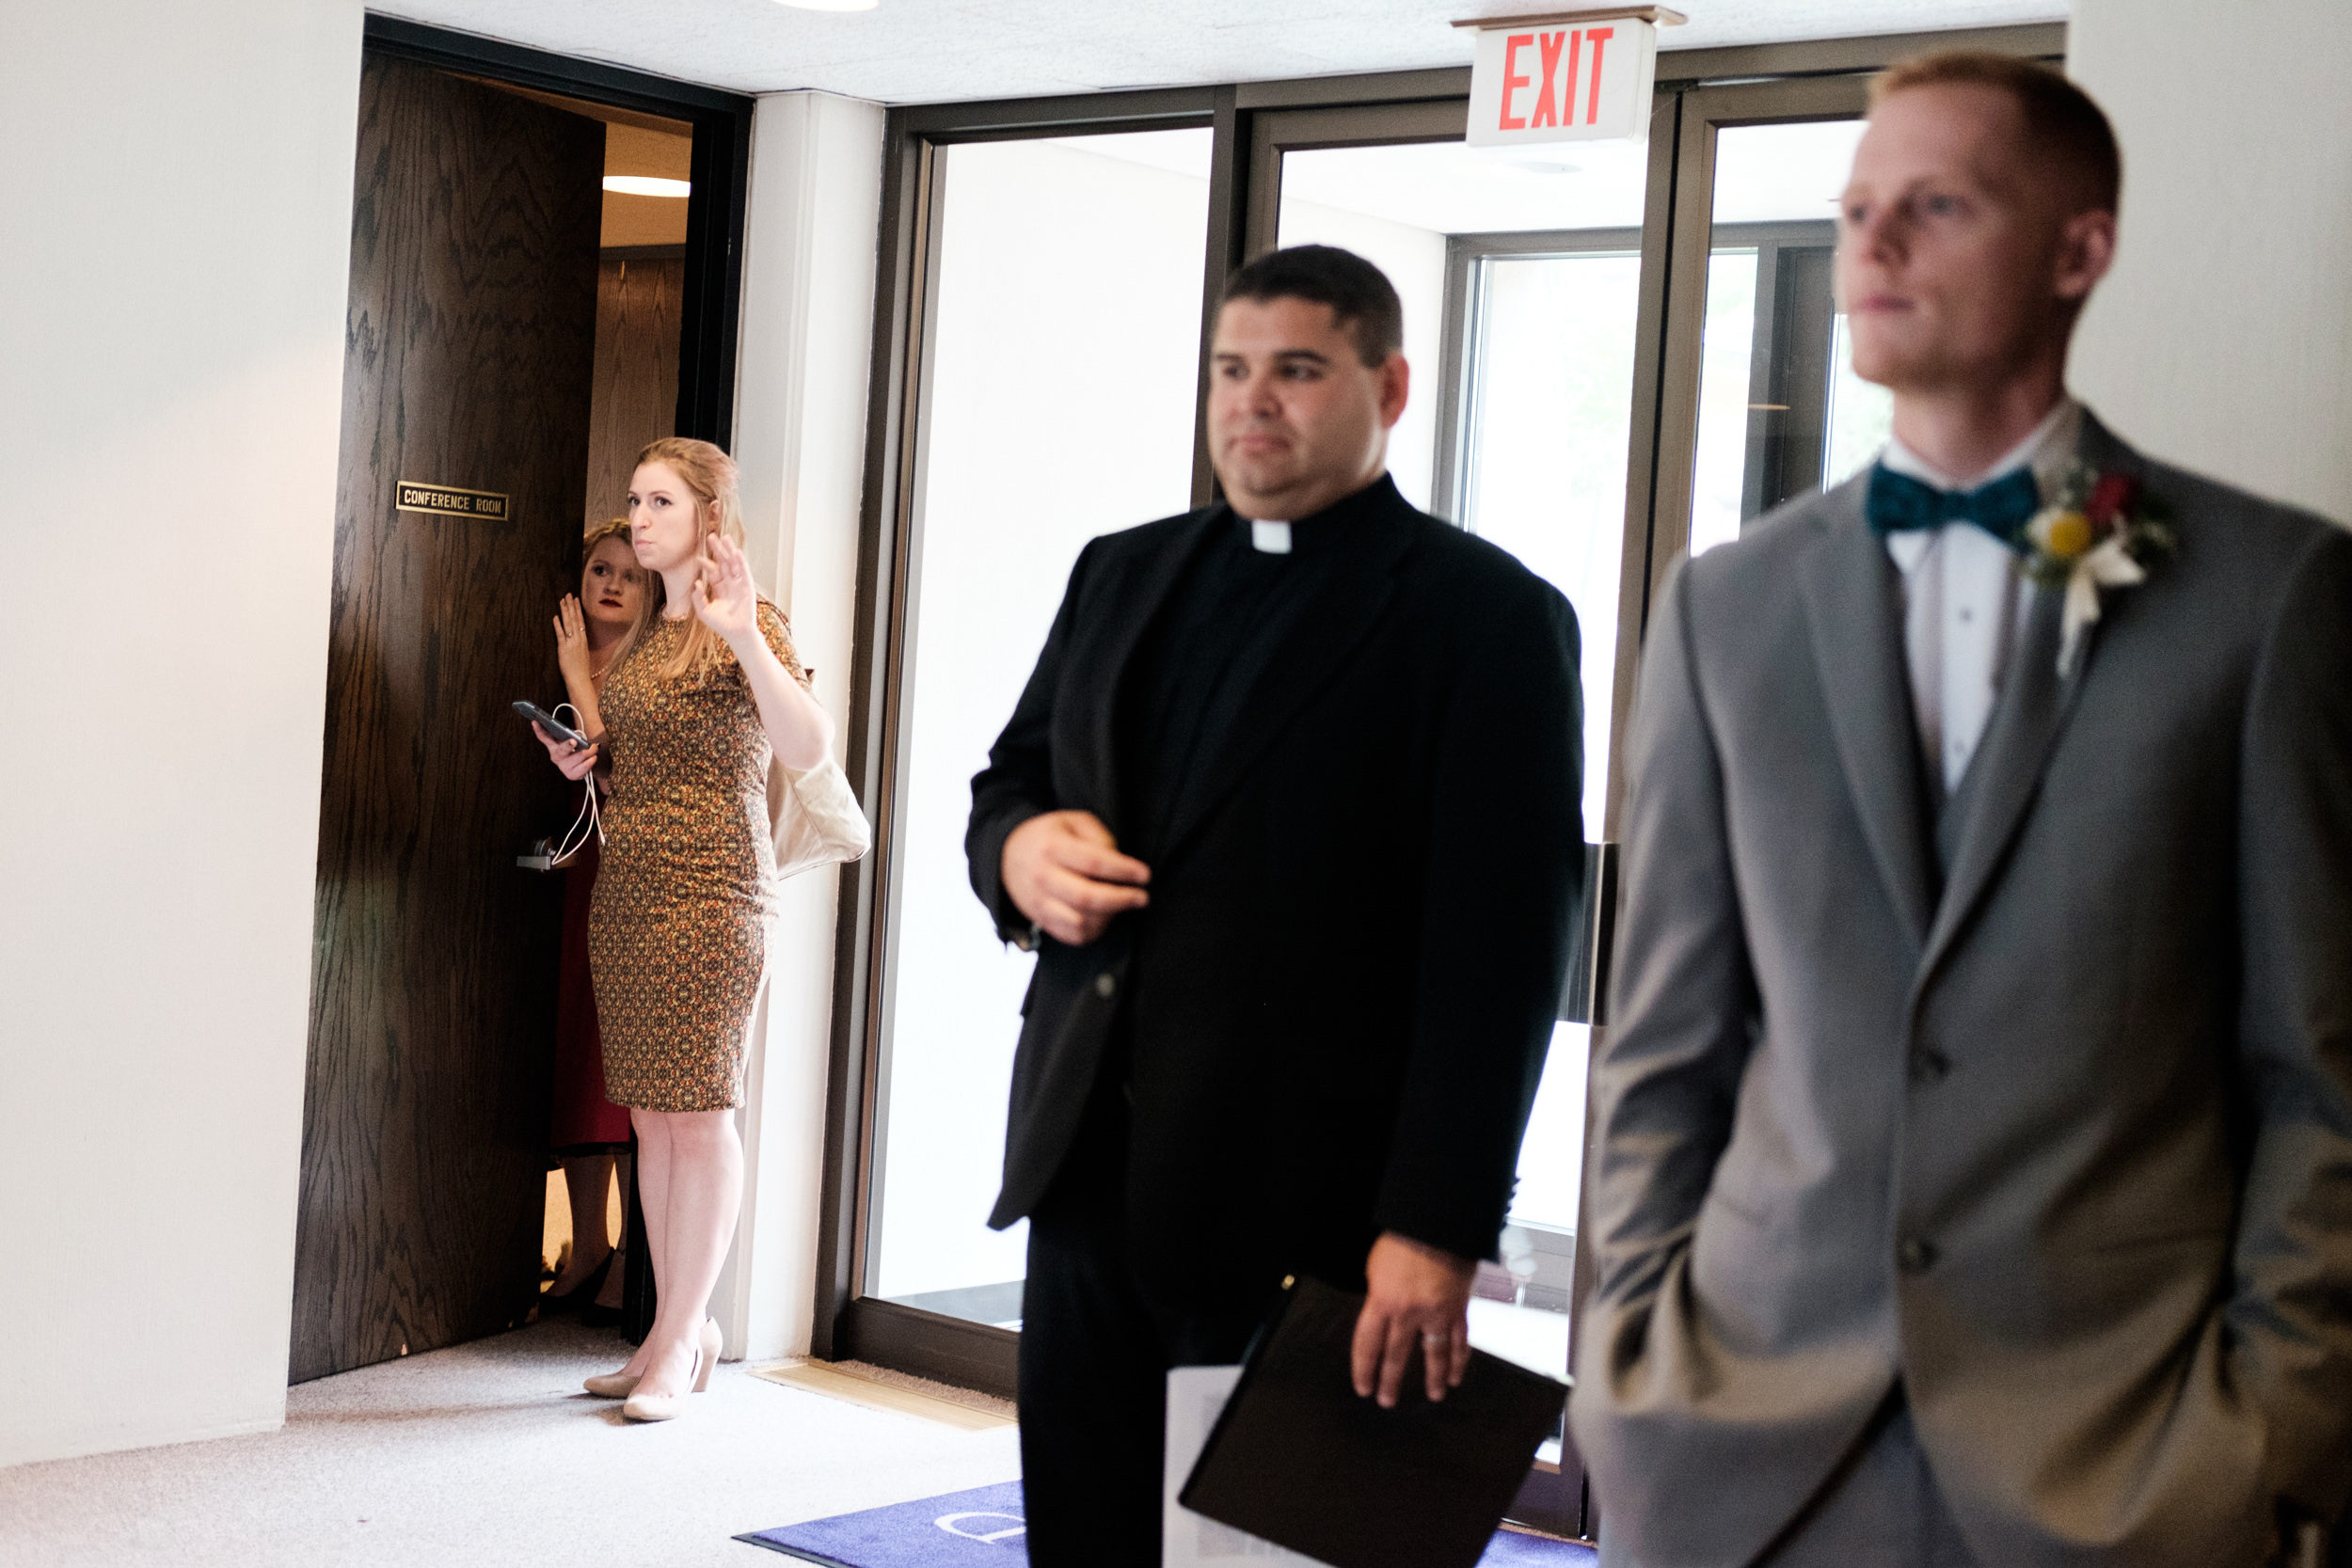 Christian & Sarah wedding photography by Brian milo-142.jpg